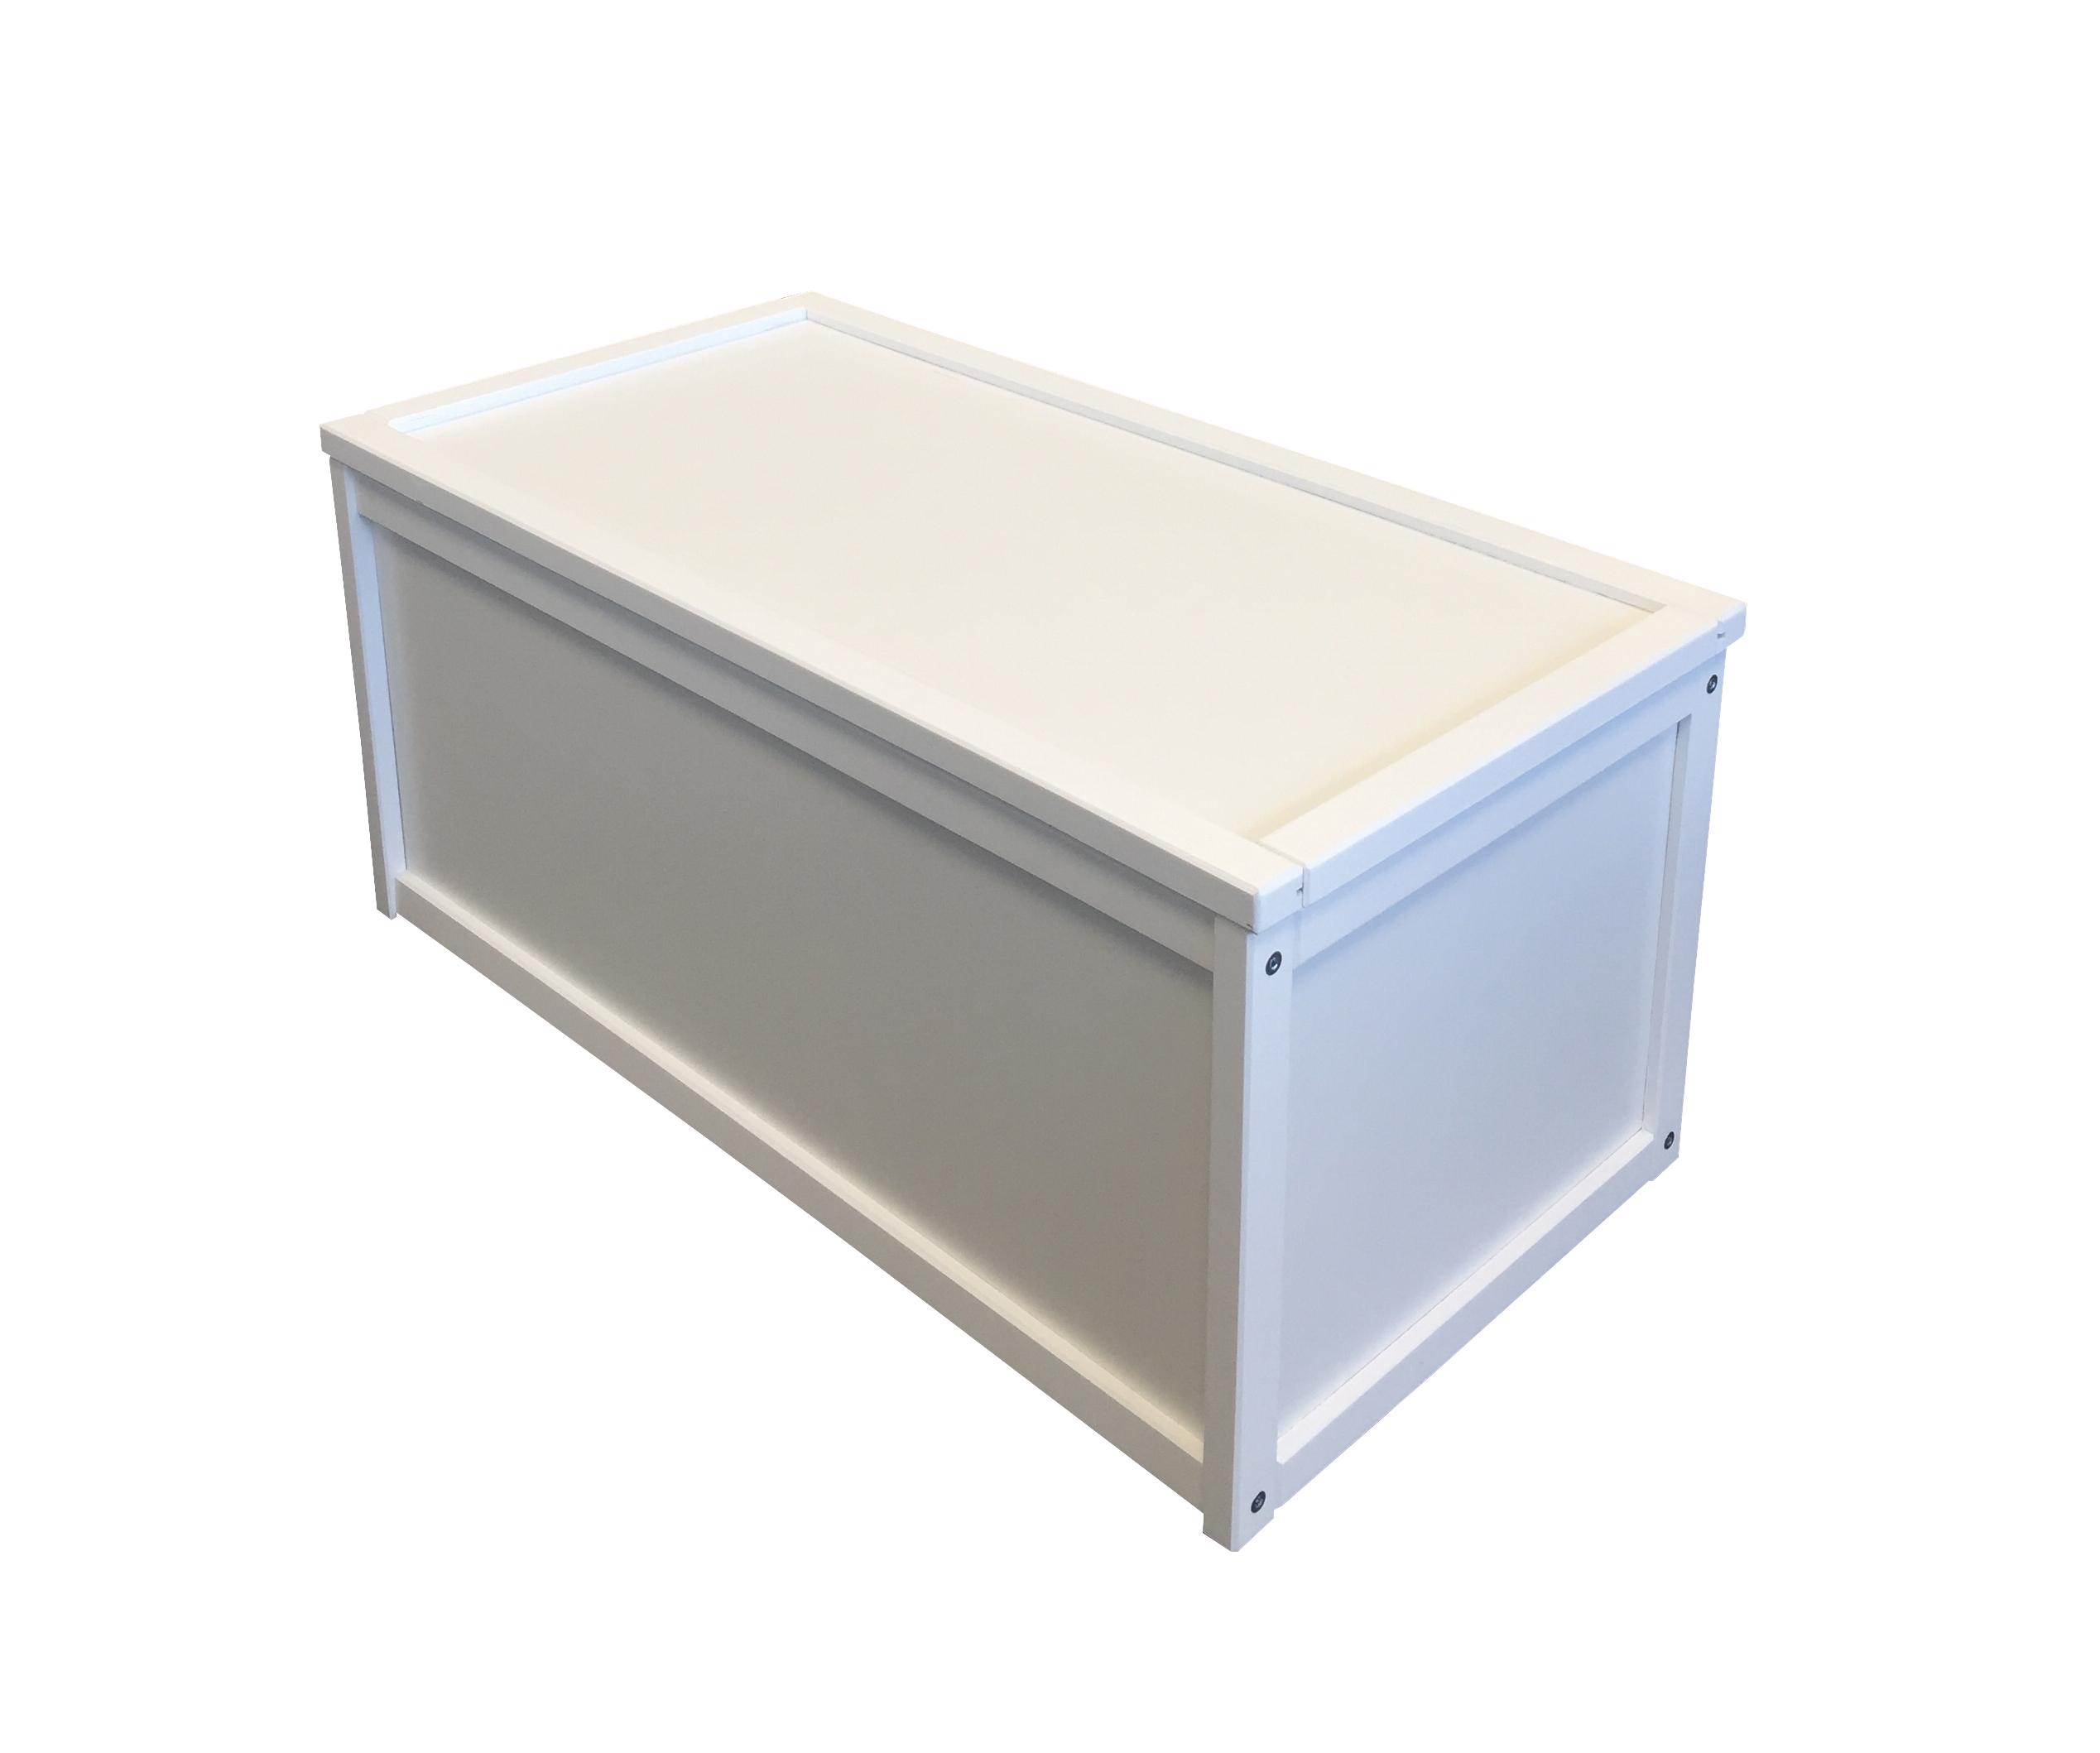 New White Wooden Toy Box Storage Unit Childrens Kids Chest